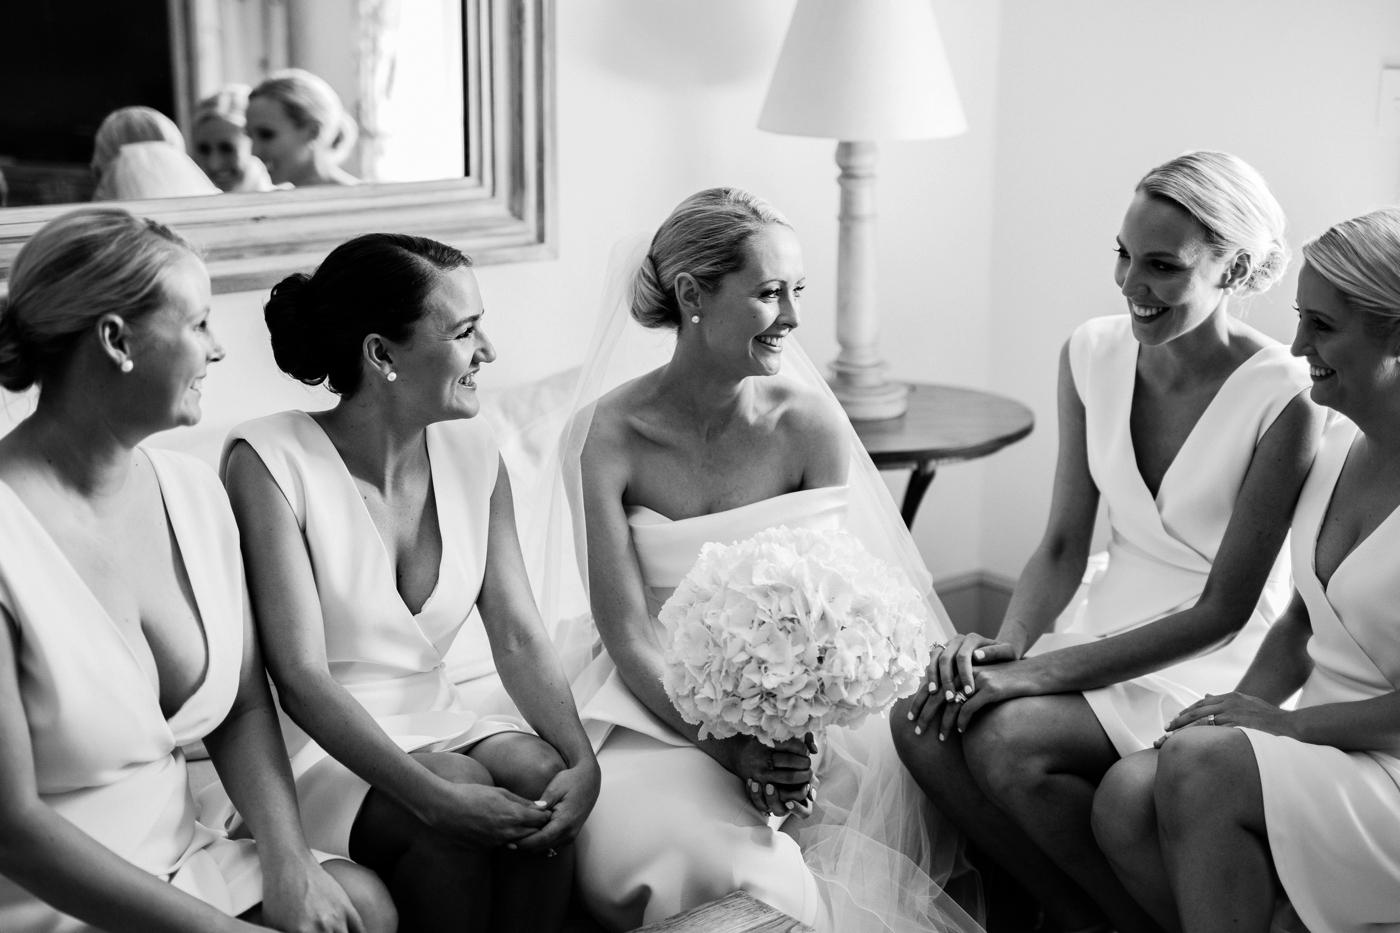 Bec & Brad - Waverley Estate Wedding - Natural Wedding Photographer in Adelaide - www.katherineschultzphotography.com 15